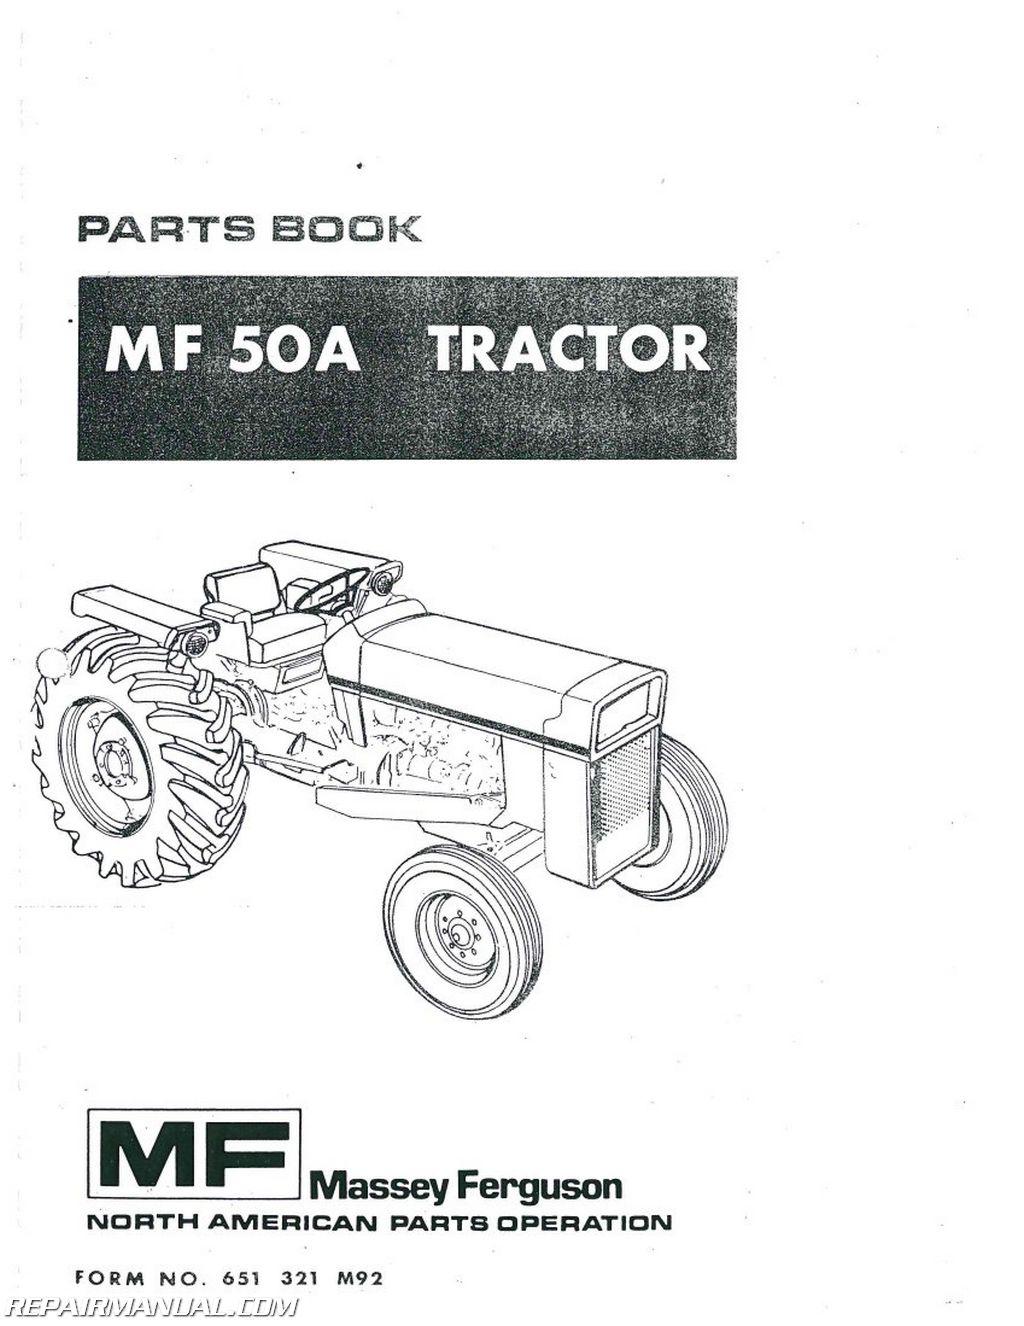 Massey Ferguson Repair Parts : Massey ferguson mf a dsl ind tractor parts manual ebay